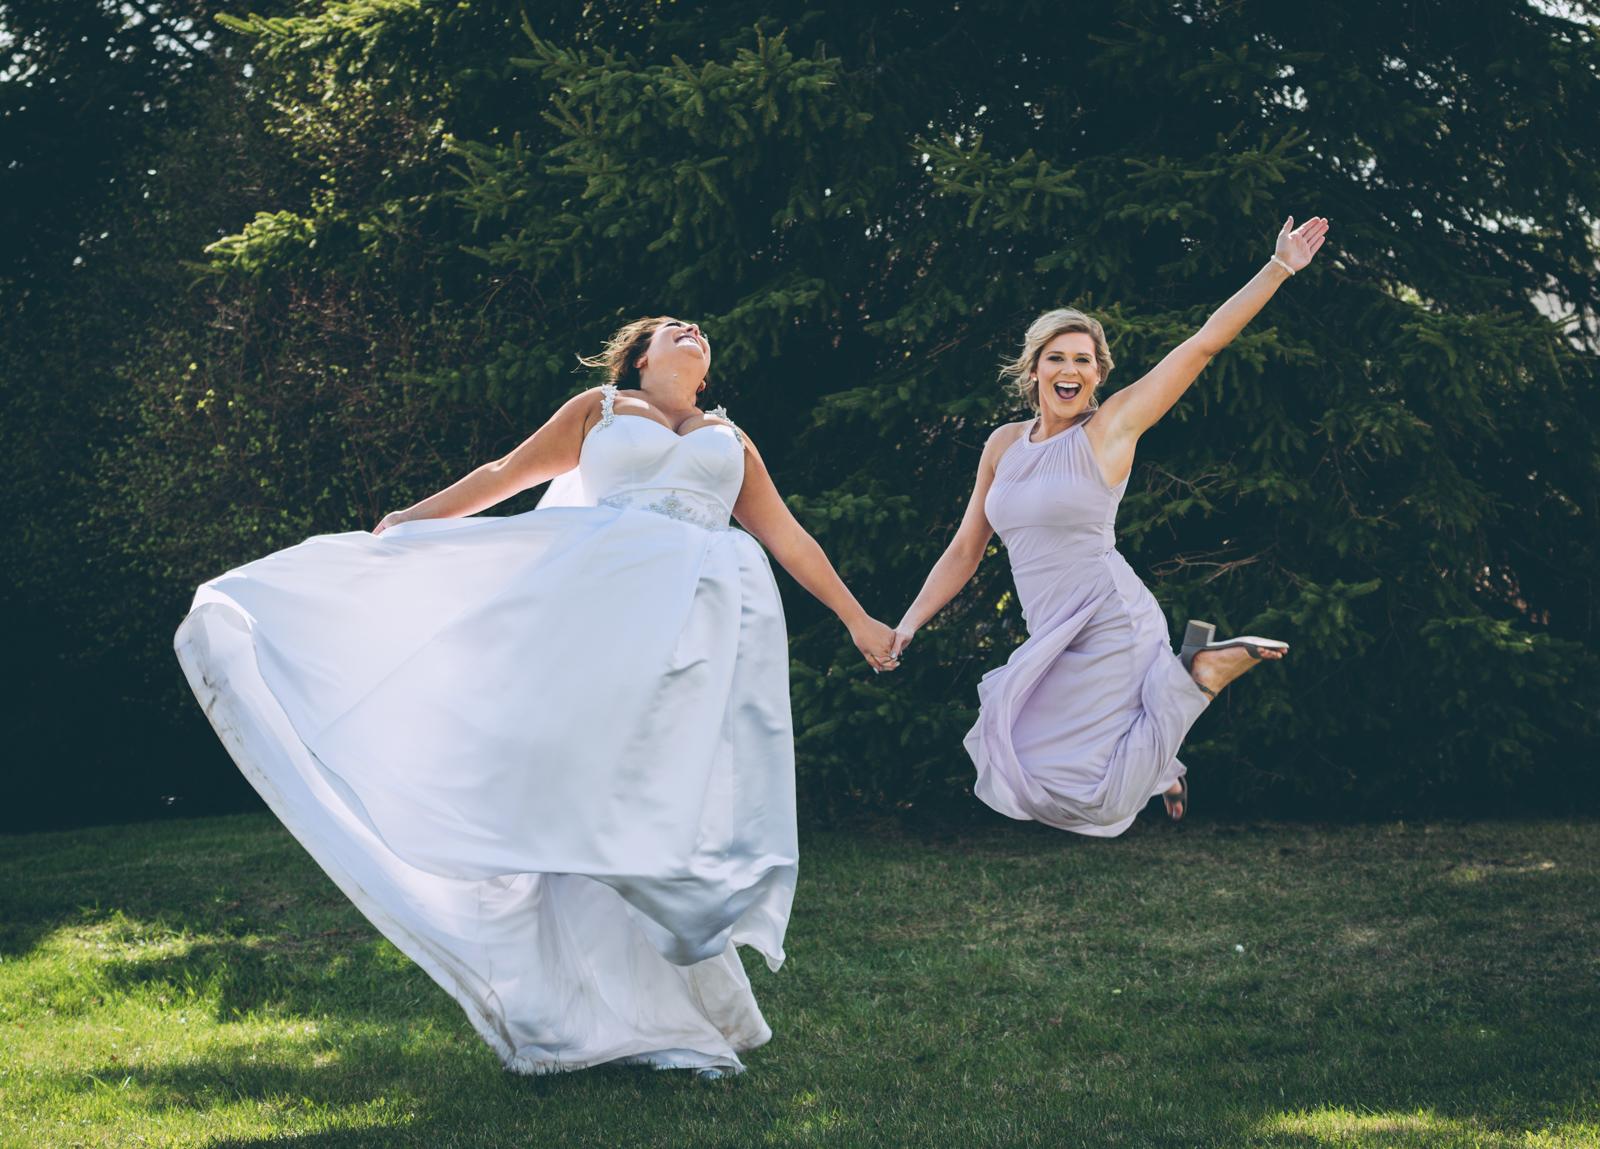 top-wedding-photos-2018-blog-8.jpg